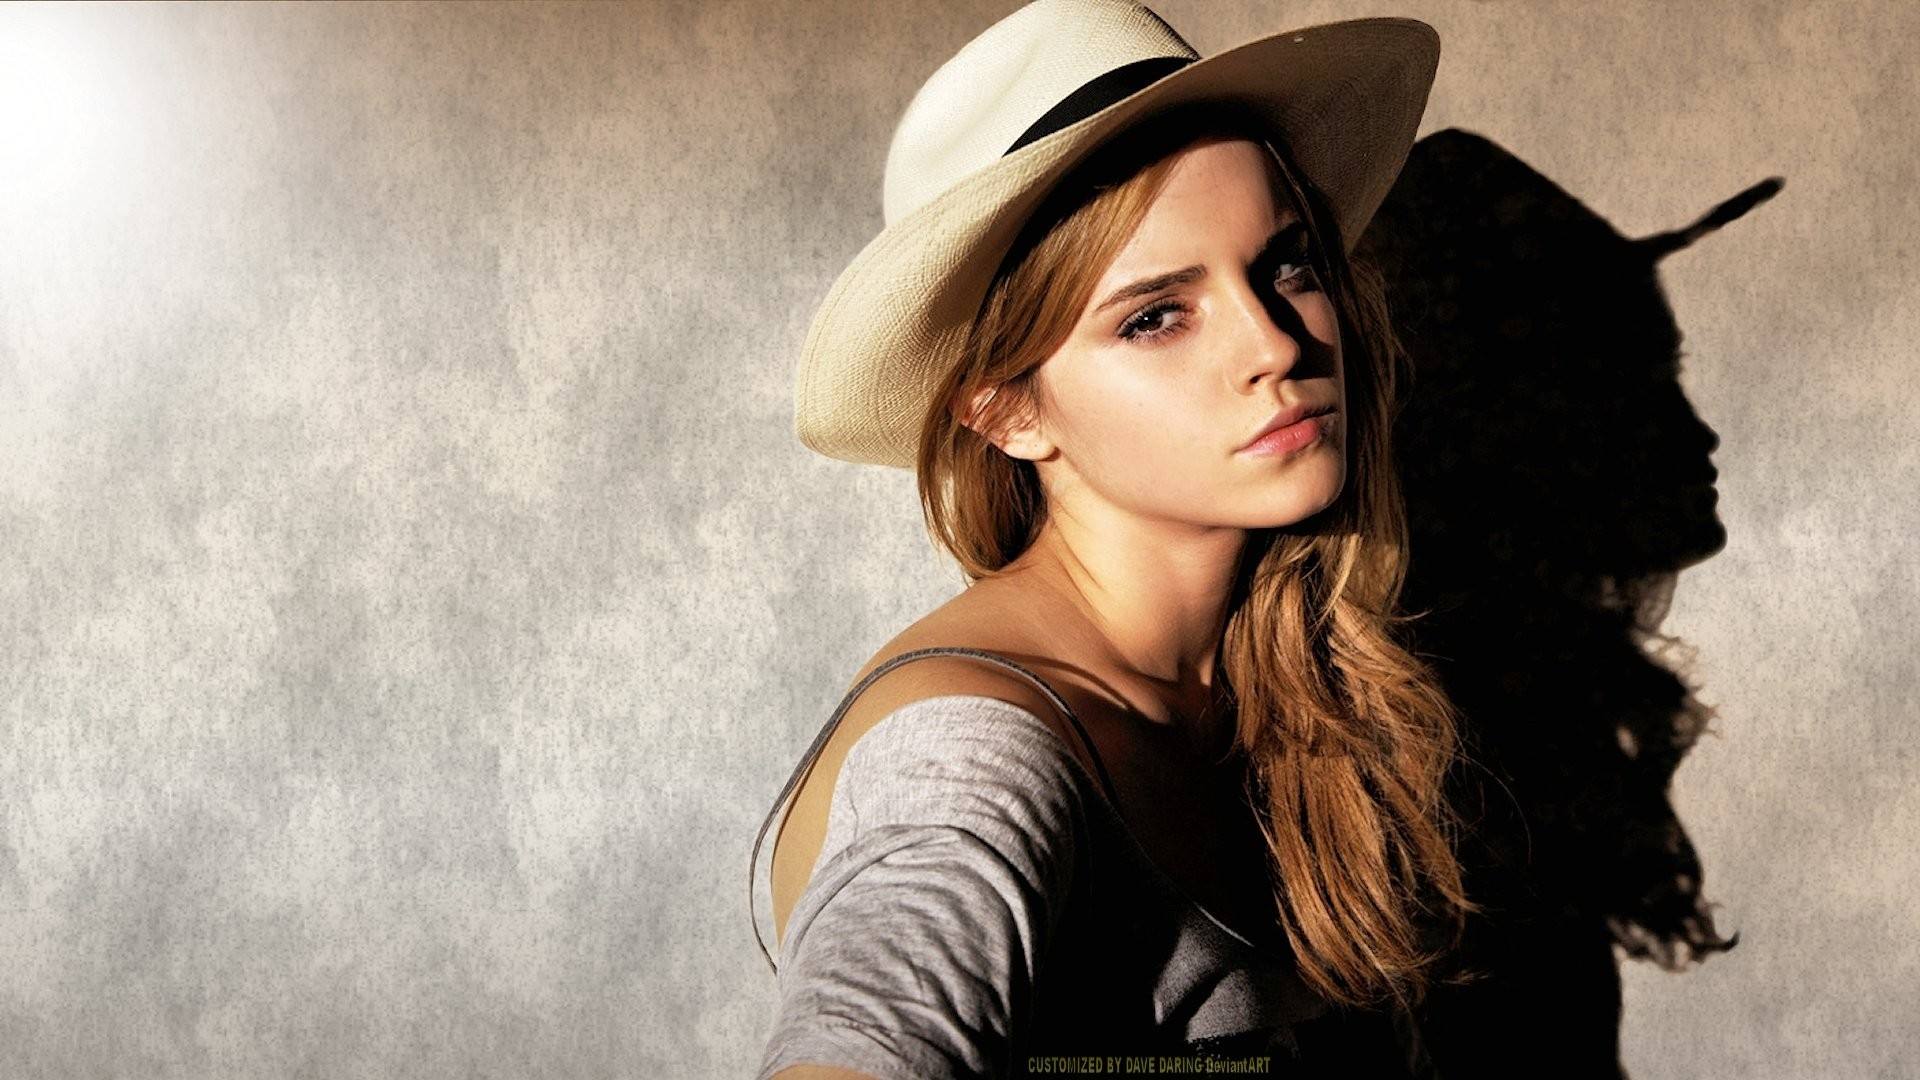 [1920 x 1080] Emma Watson is one sexy/classy Mudblood.